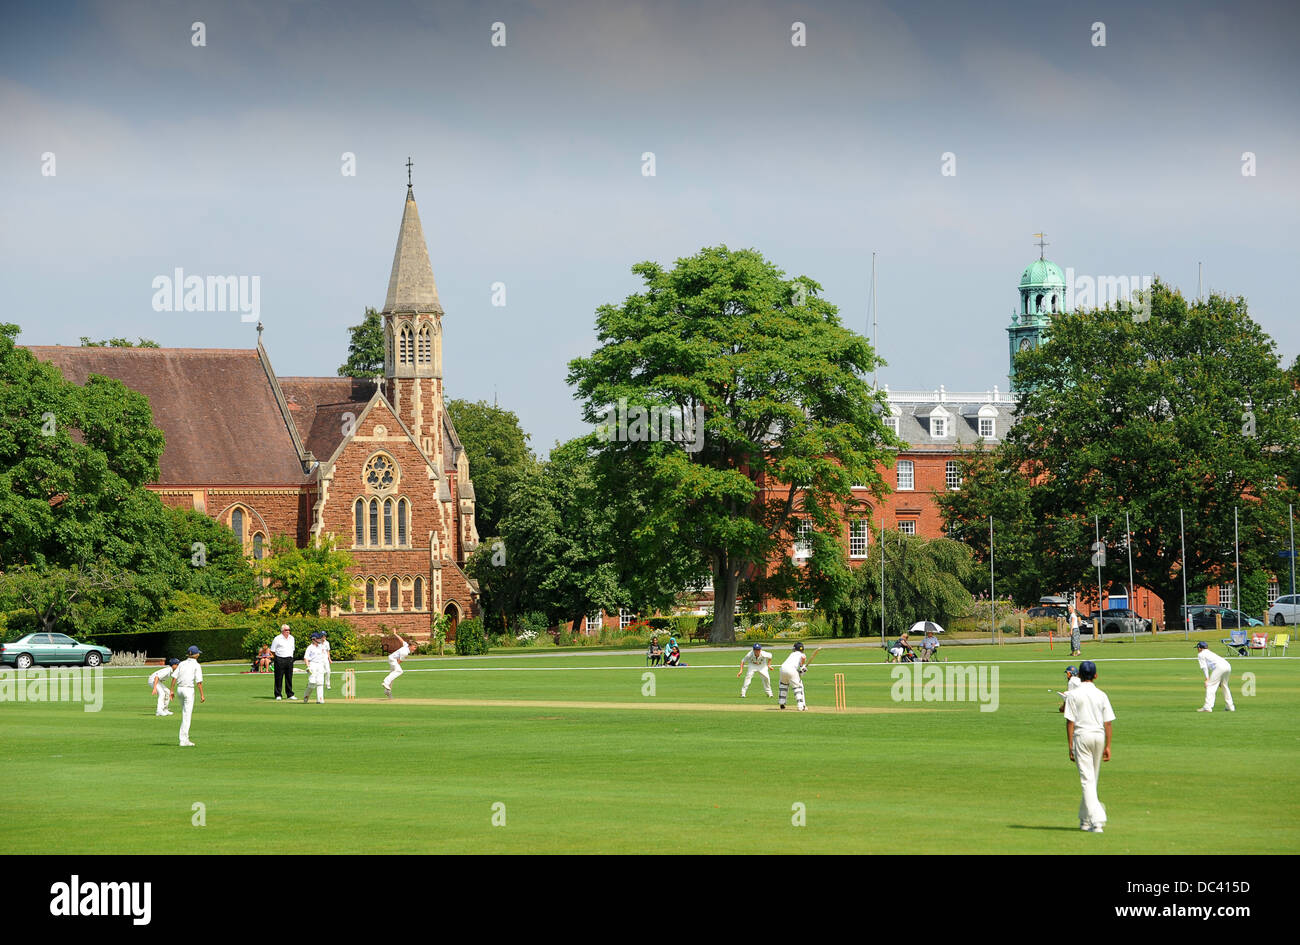 Junior boys cricket match at Shrewsbury School in England Uk - Stock Image